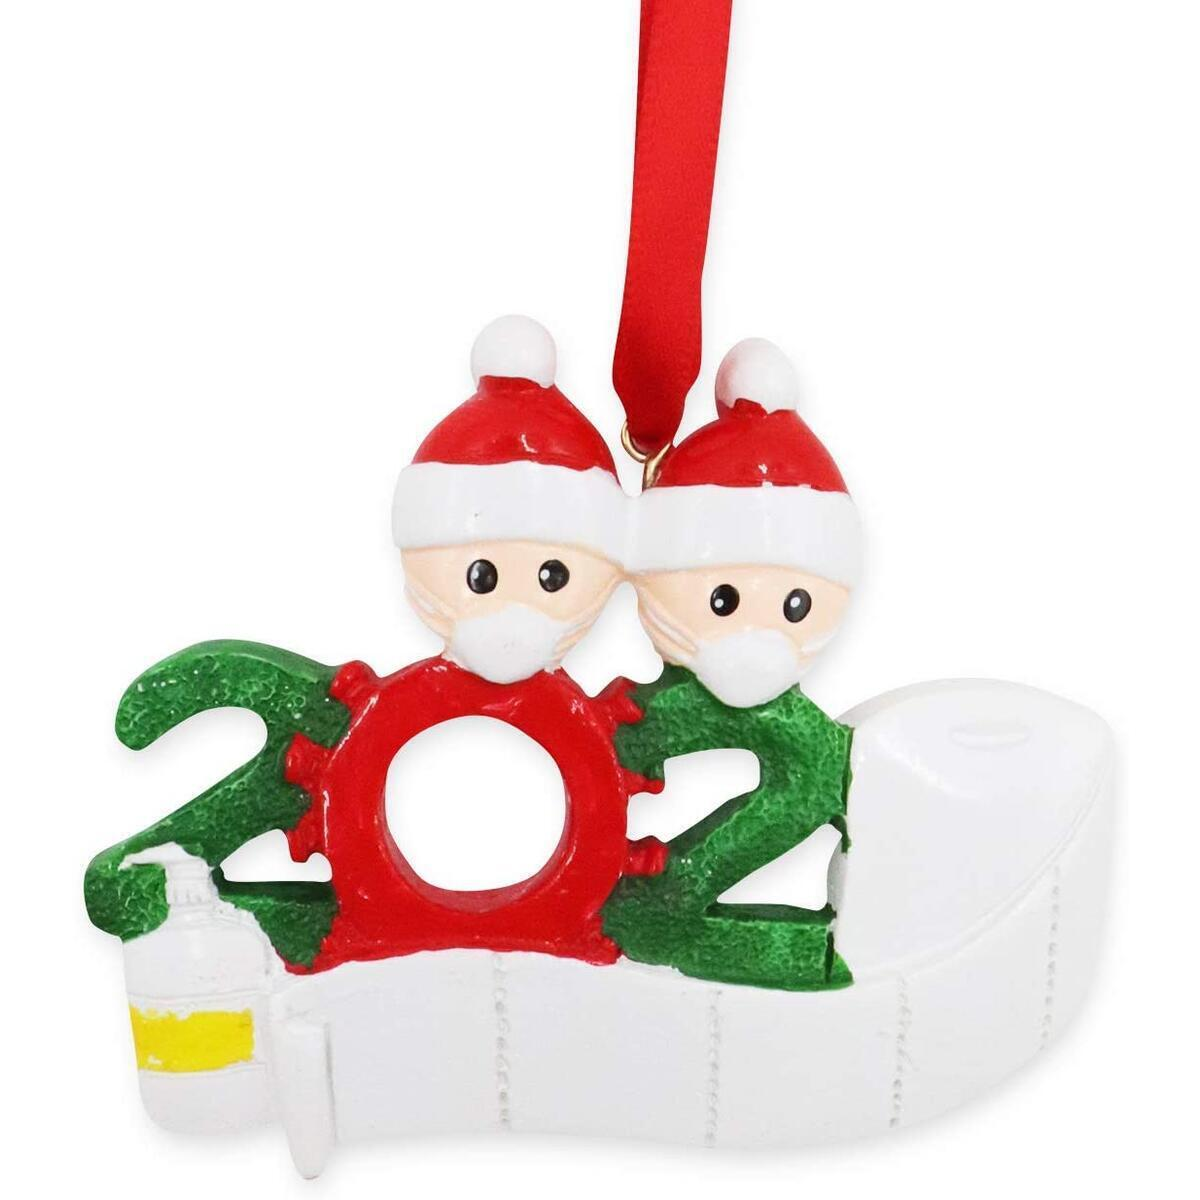 buddy4baby Personalized Christmas Ornaments, 2020 Quarantine Survivor Couple Customized Xmas Tree Hanging Set DIY Creative Gift (family-2-w)